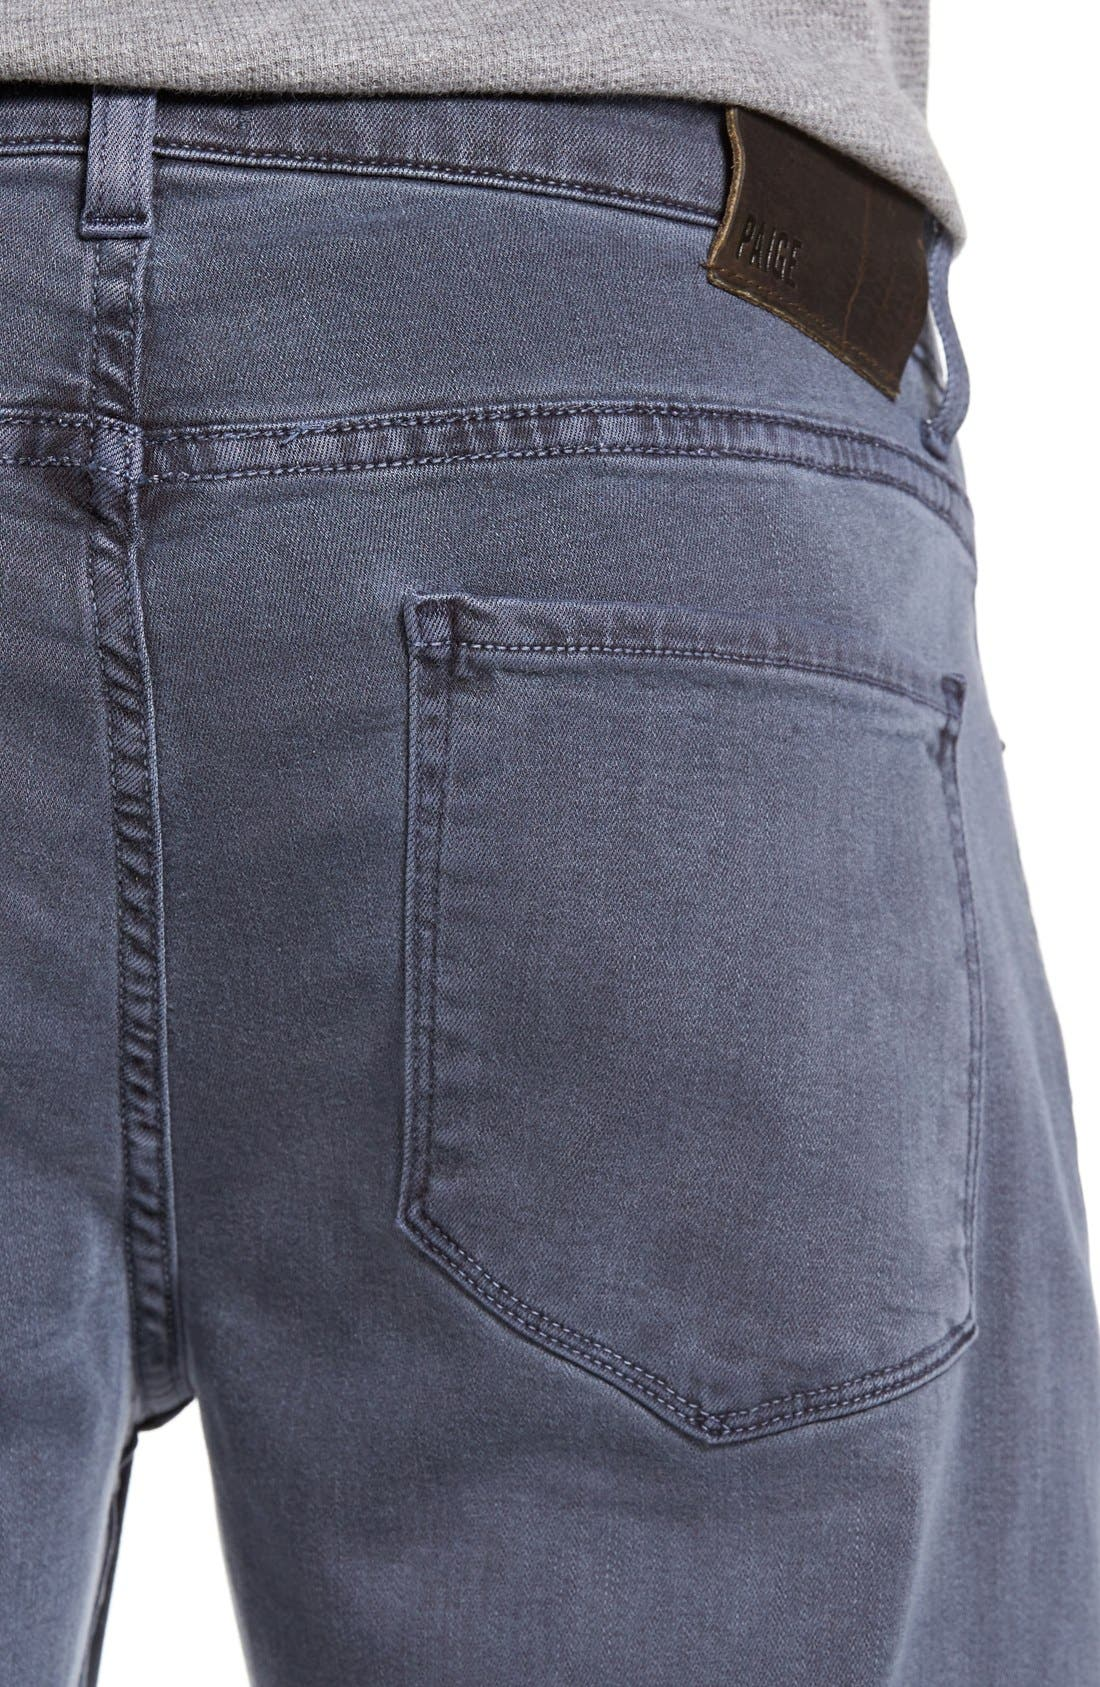 Transcend - Federal Slim Straight Leg Jeans,                             Alternate thumbnail 5, color,                             VINTAGE NAVY